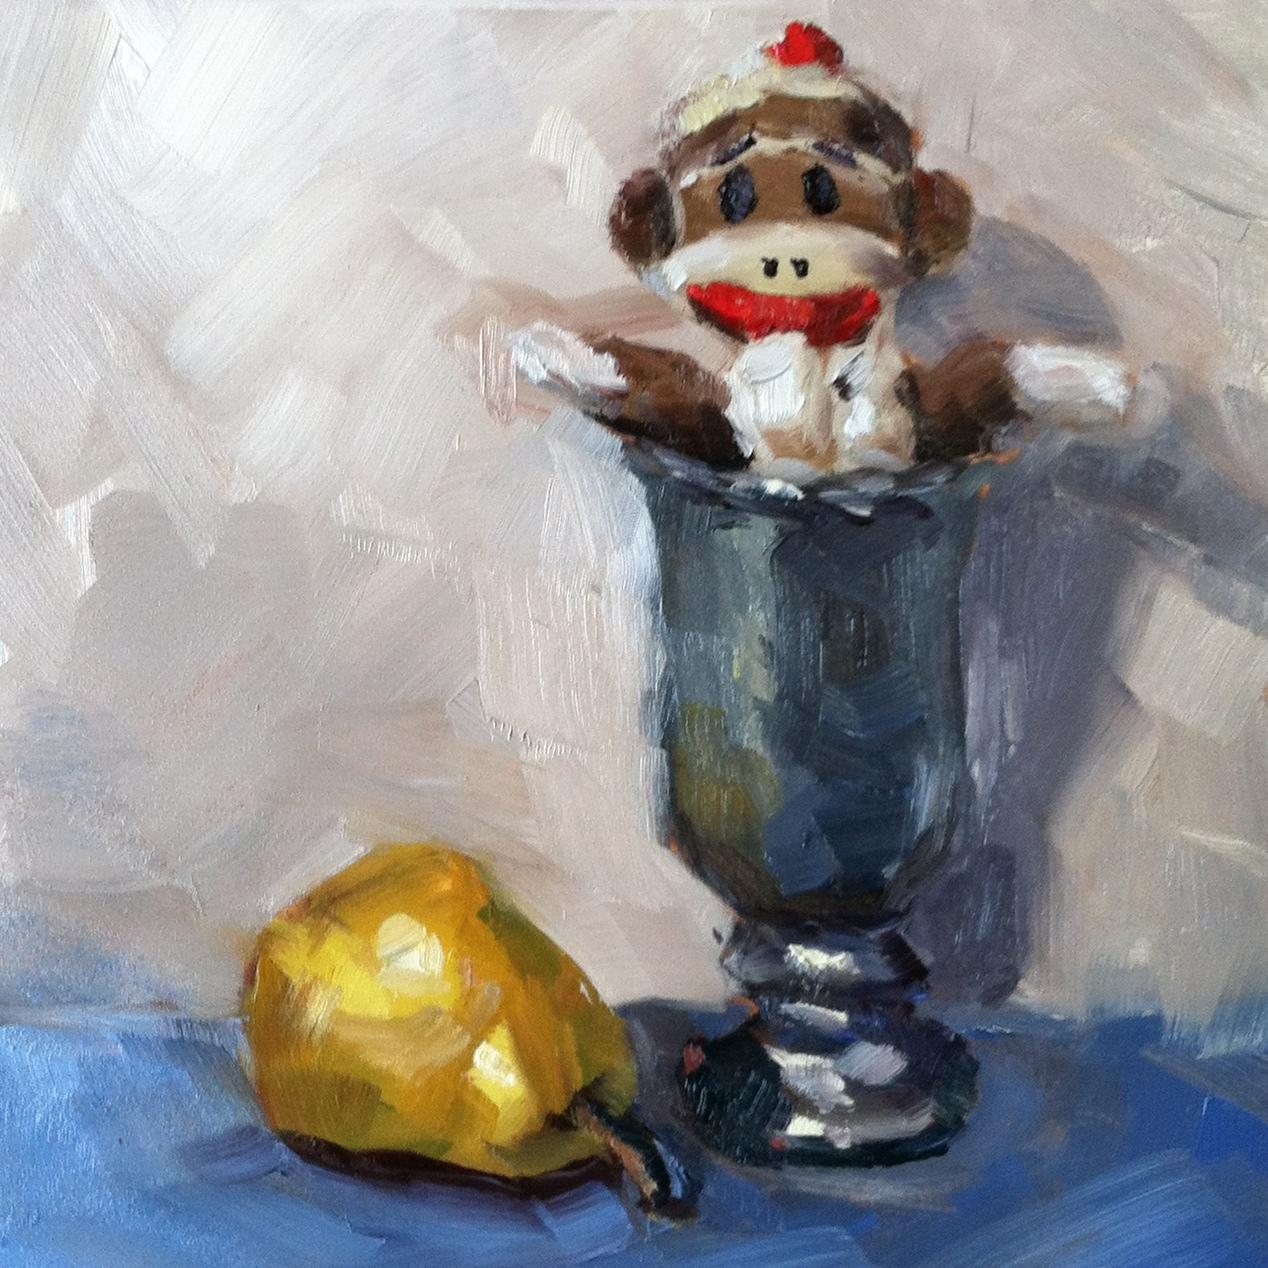 """Still Life with Sock Monkey"" original fine art by Kristen Dukat"